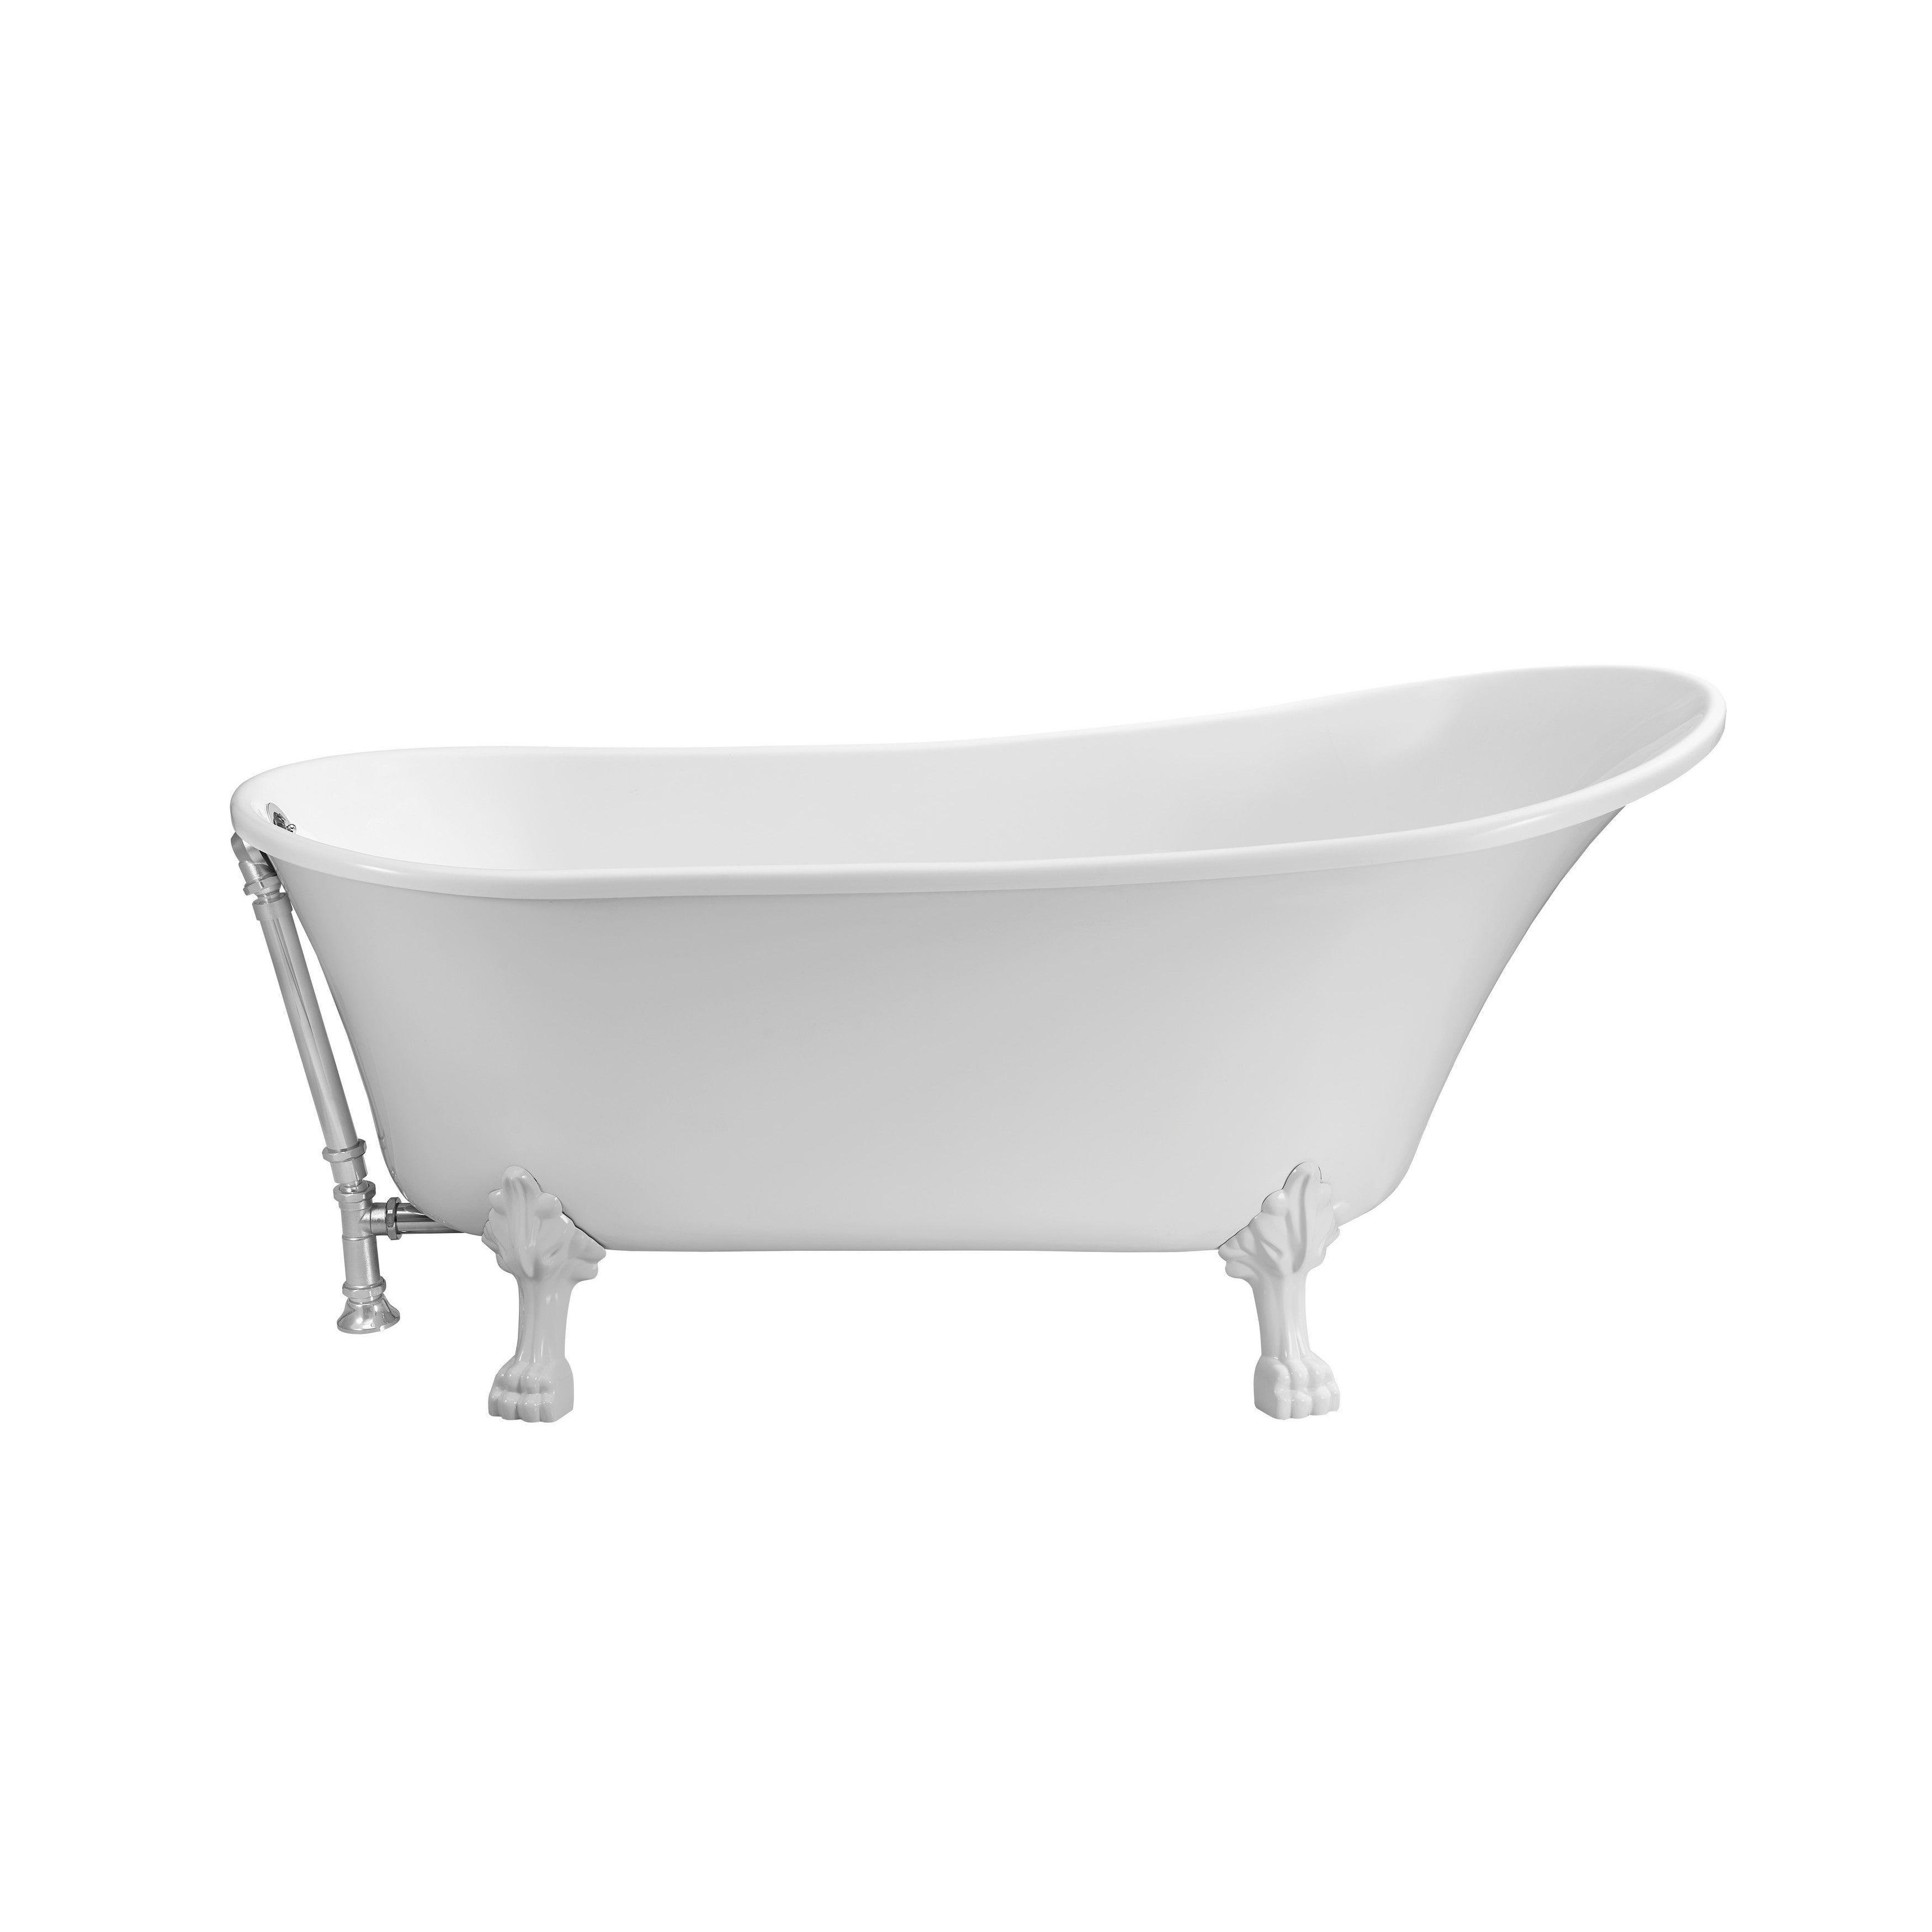 Streamline White 67-inch Soaking Clawfoot Tub with Silvertone ...